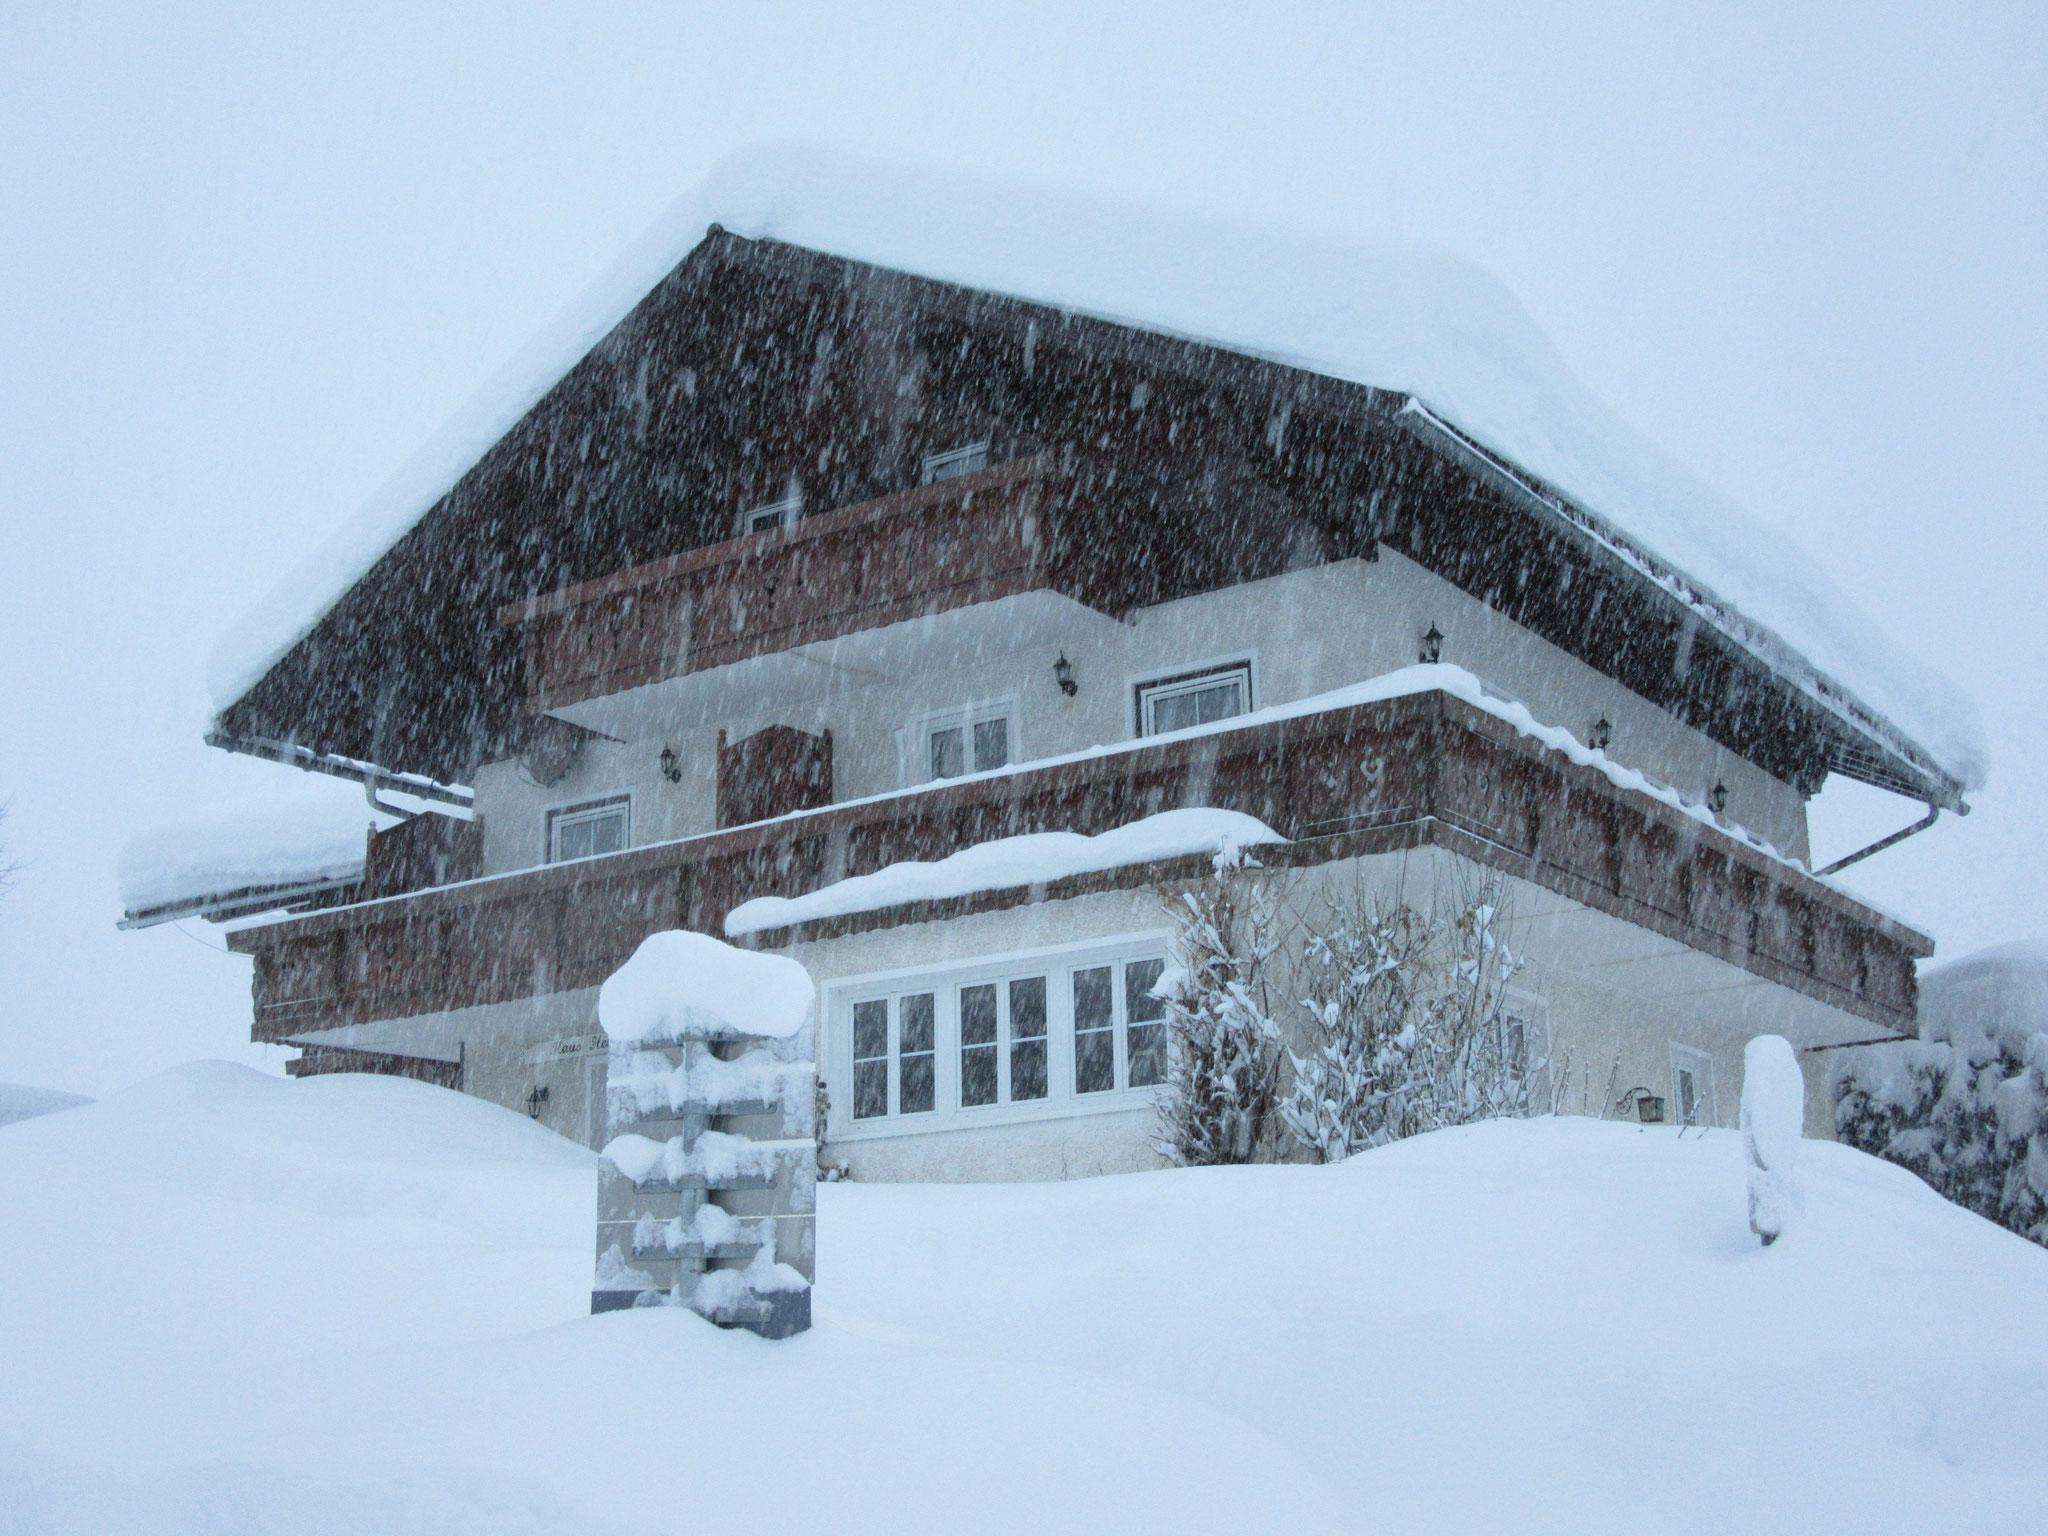 Tiefschnee im Januar 2019